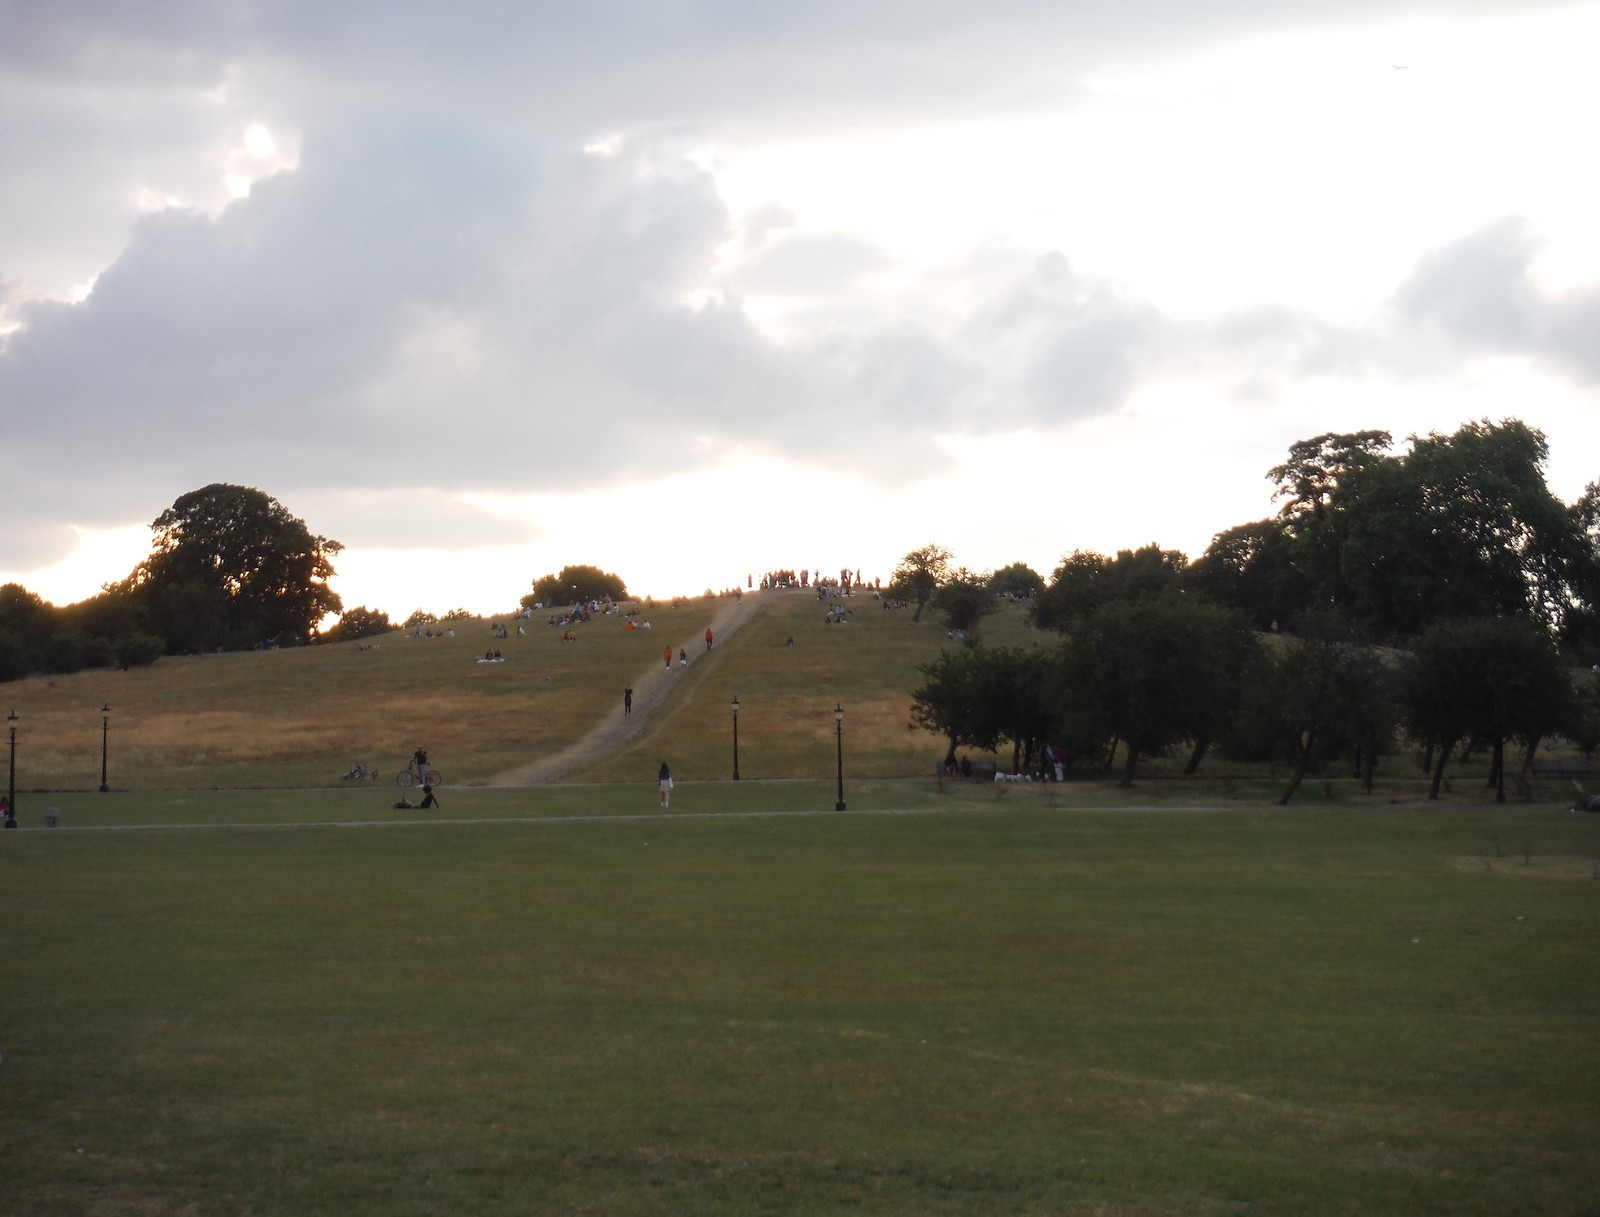 Primrose Hill SWC Short Walk 6 - Regent's Park and Primrose Hill